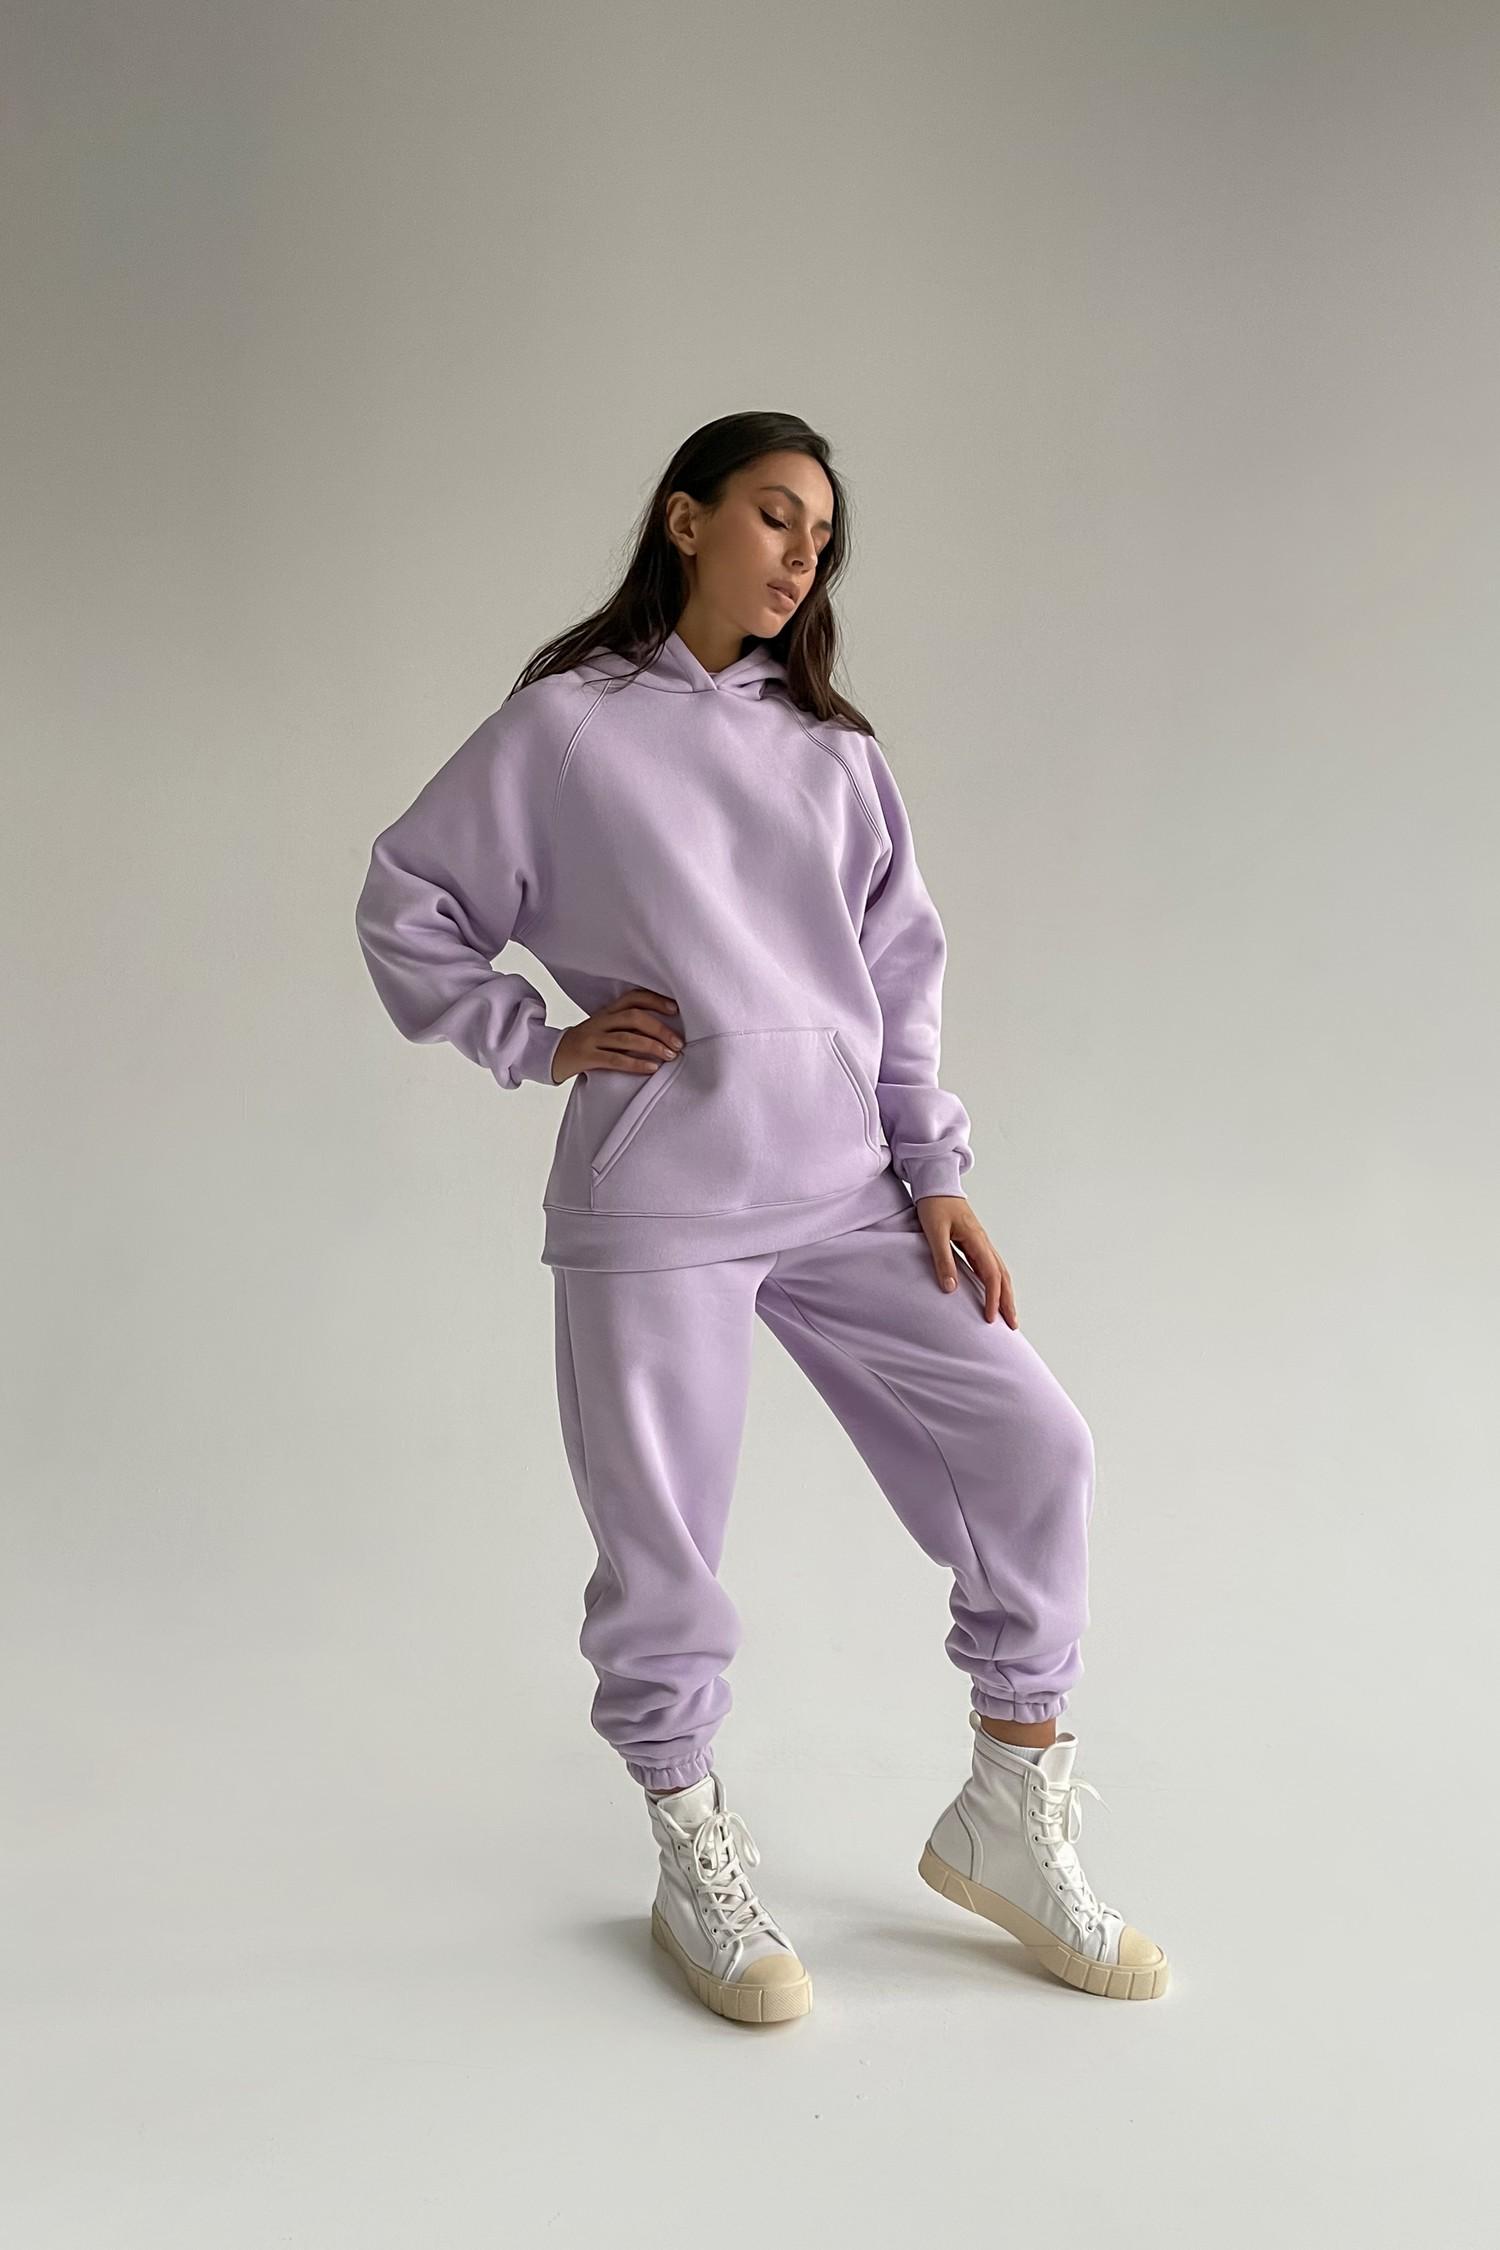 Костюм со спортивными брюками и худи violet - THE LACE